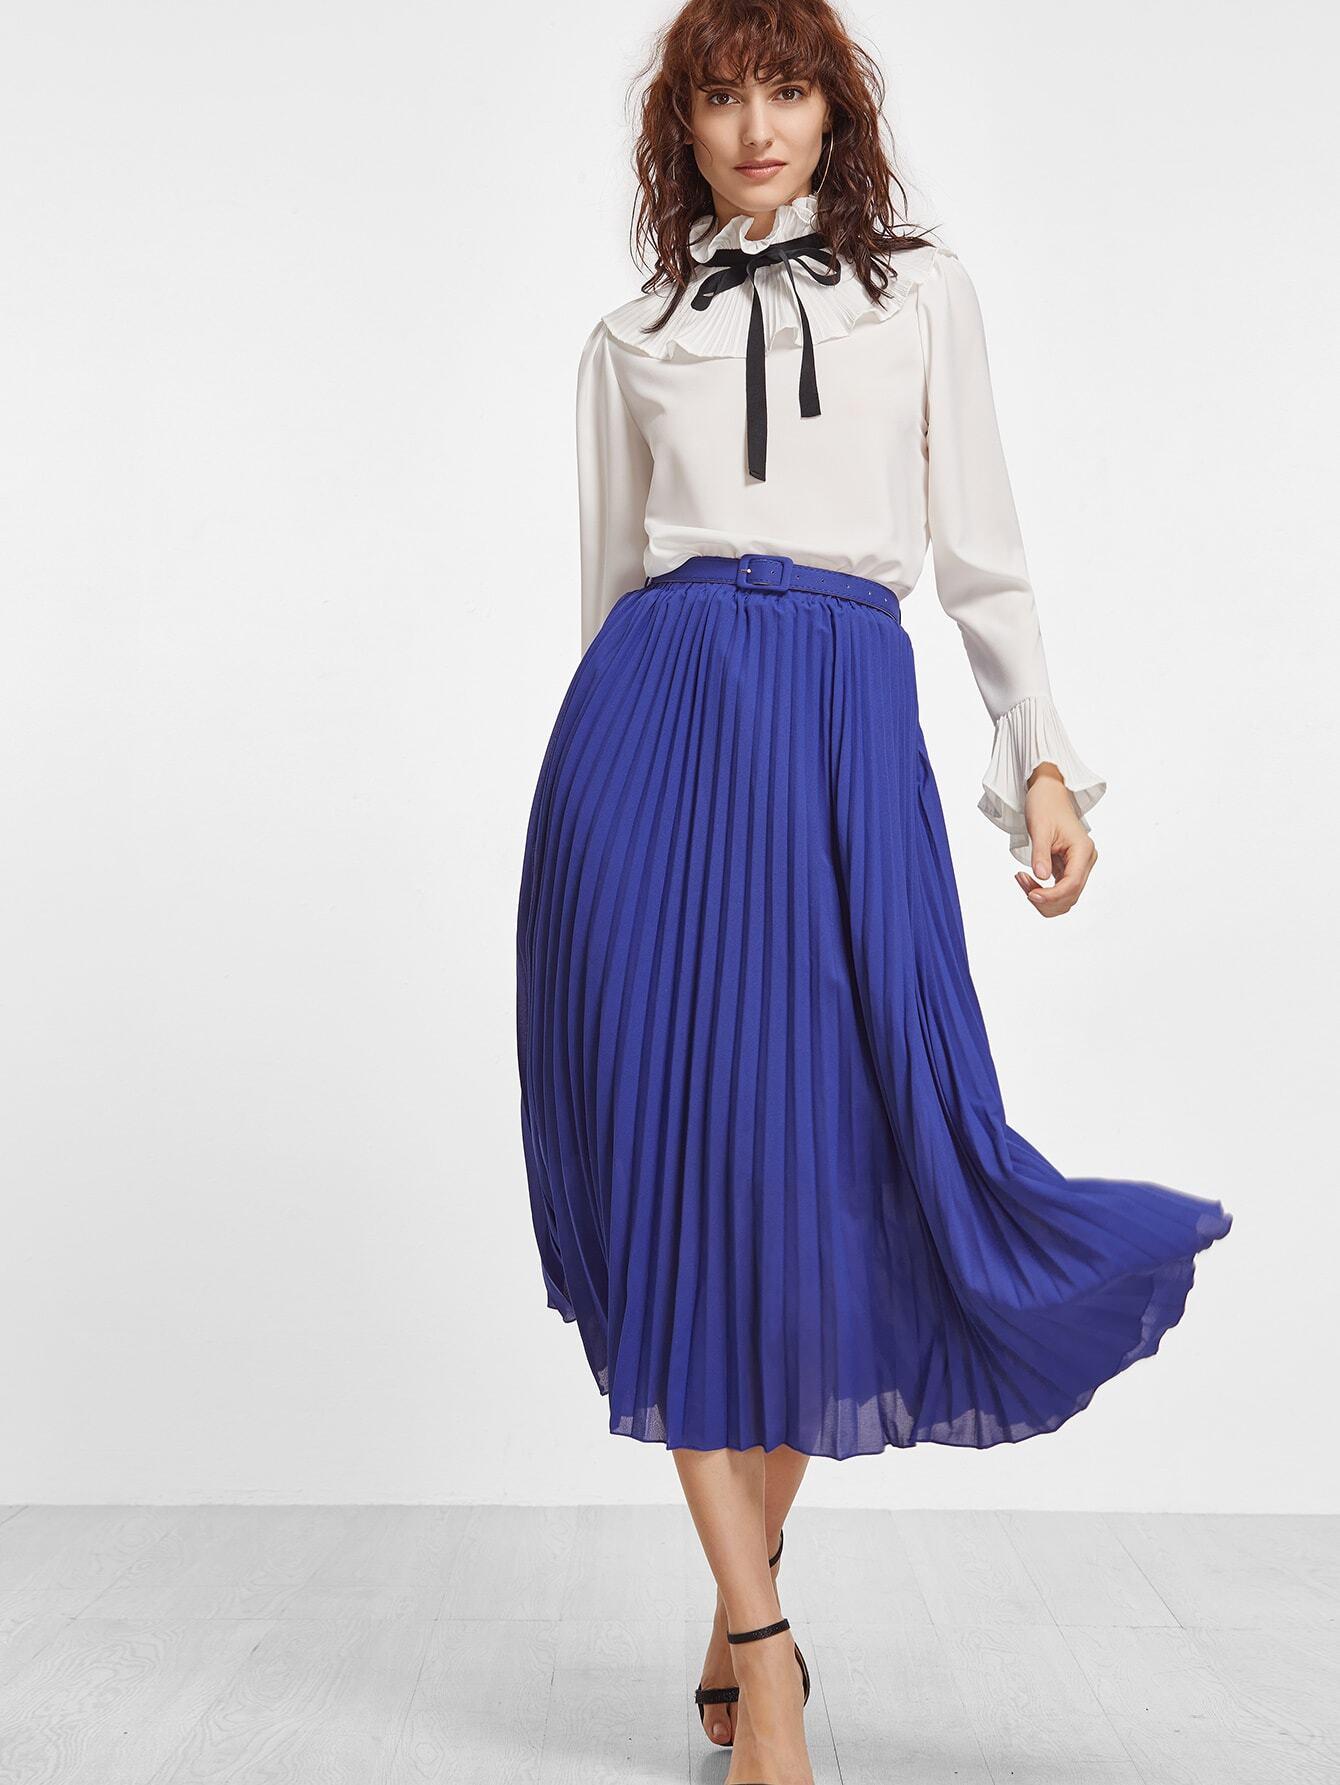 royal blue belted pleated chiffon skirt